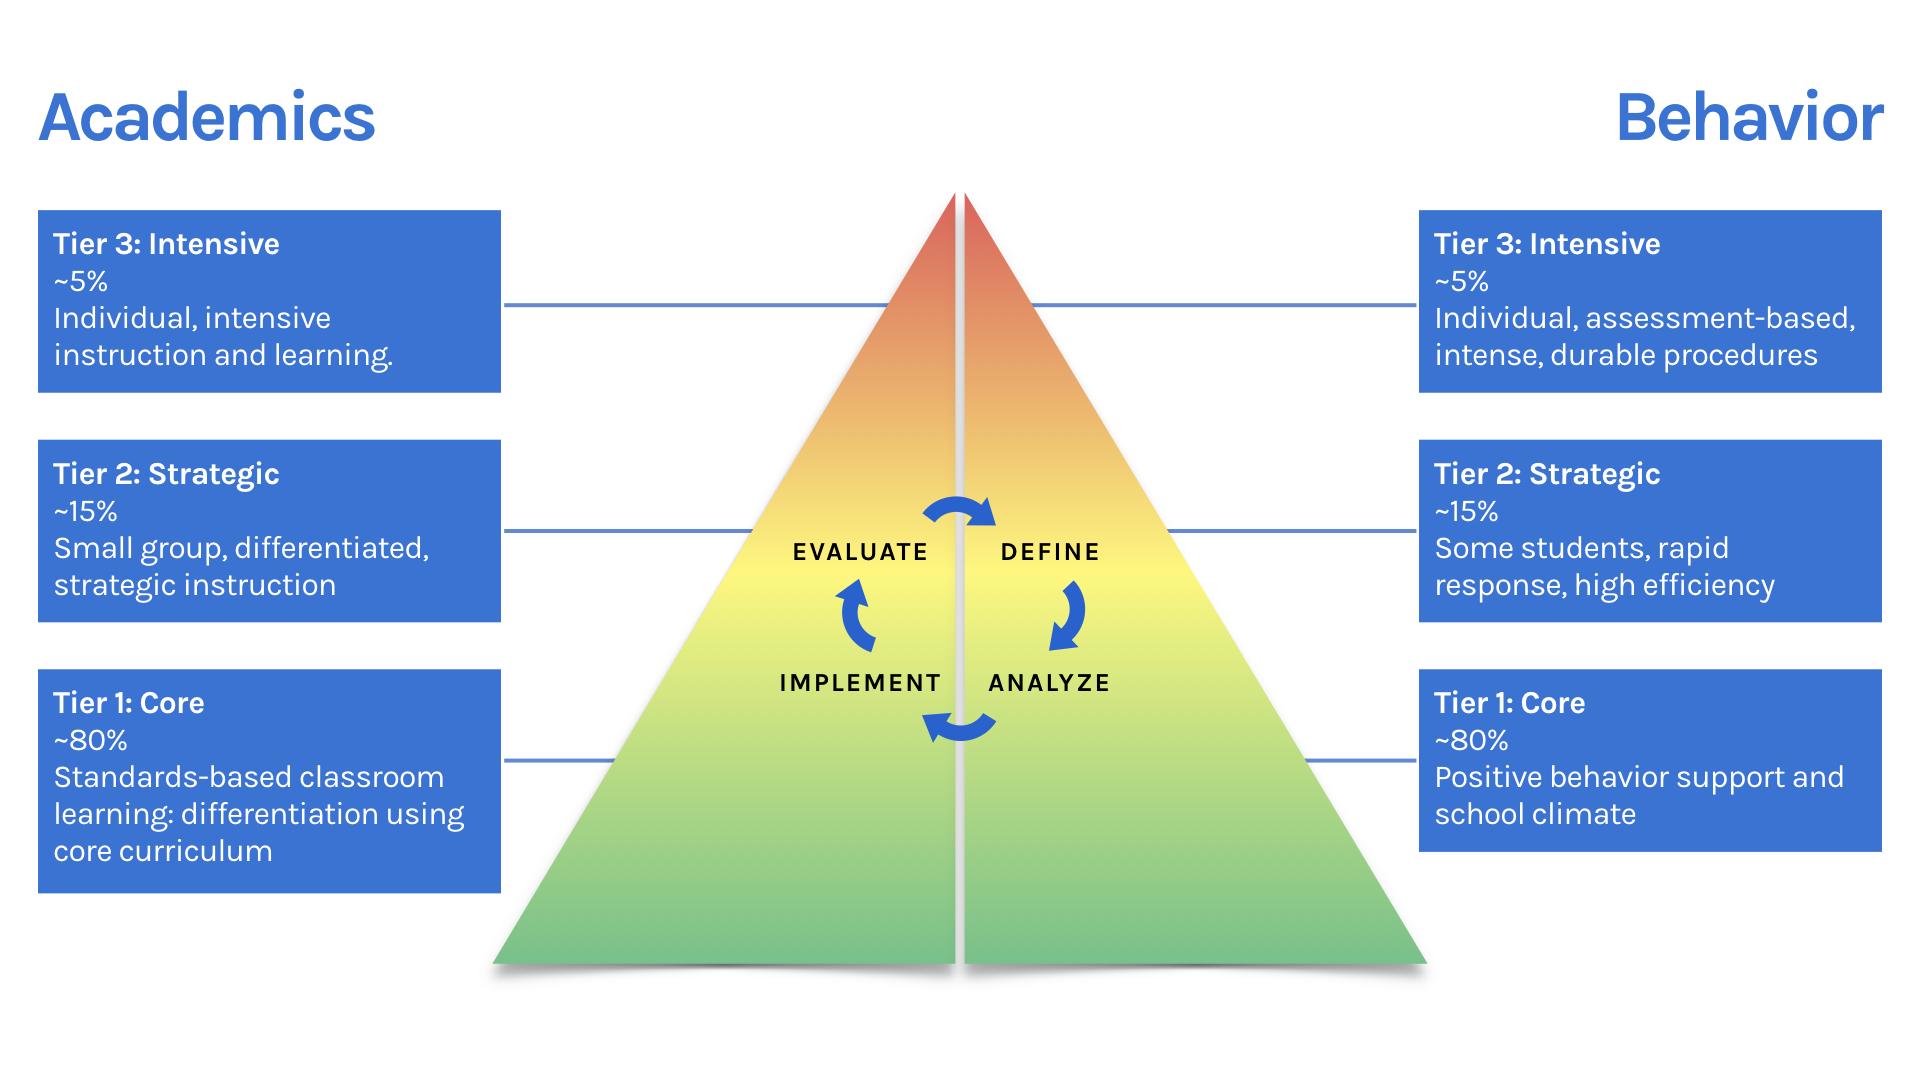 TierPyramid.001.jpeg